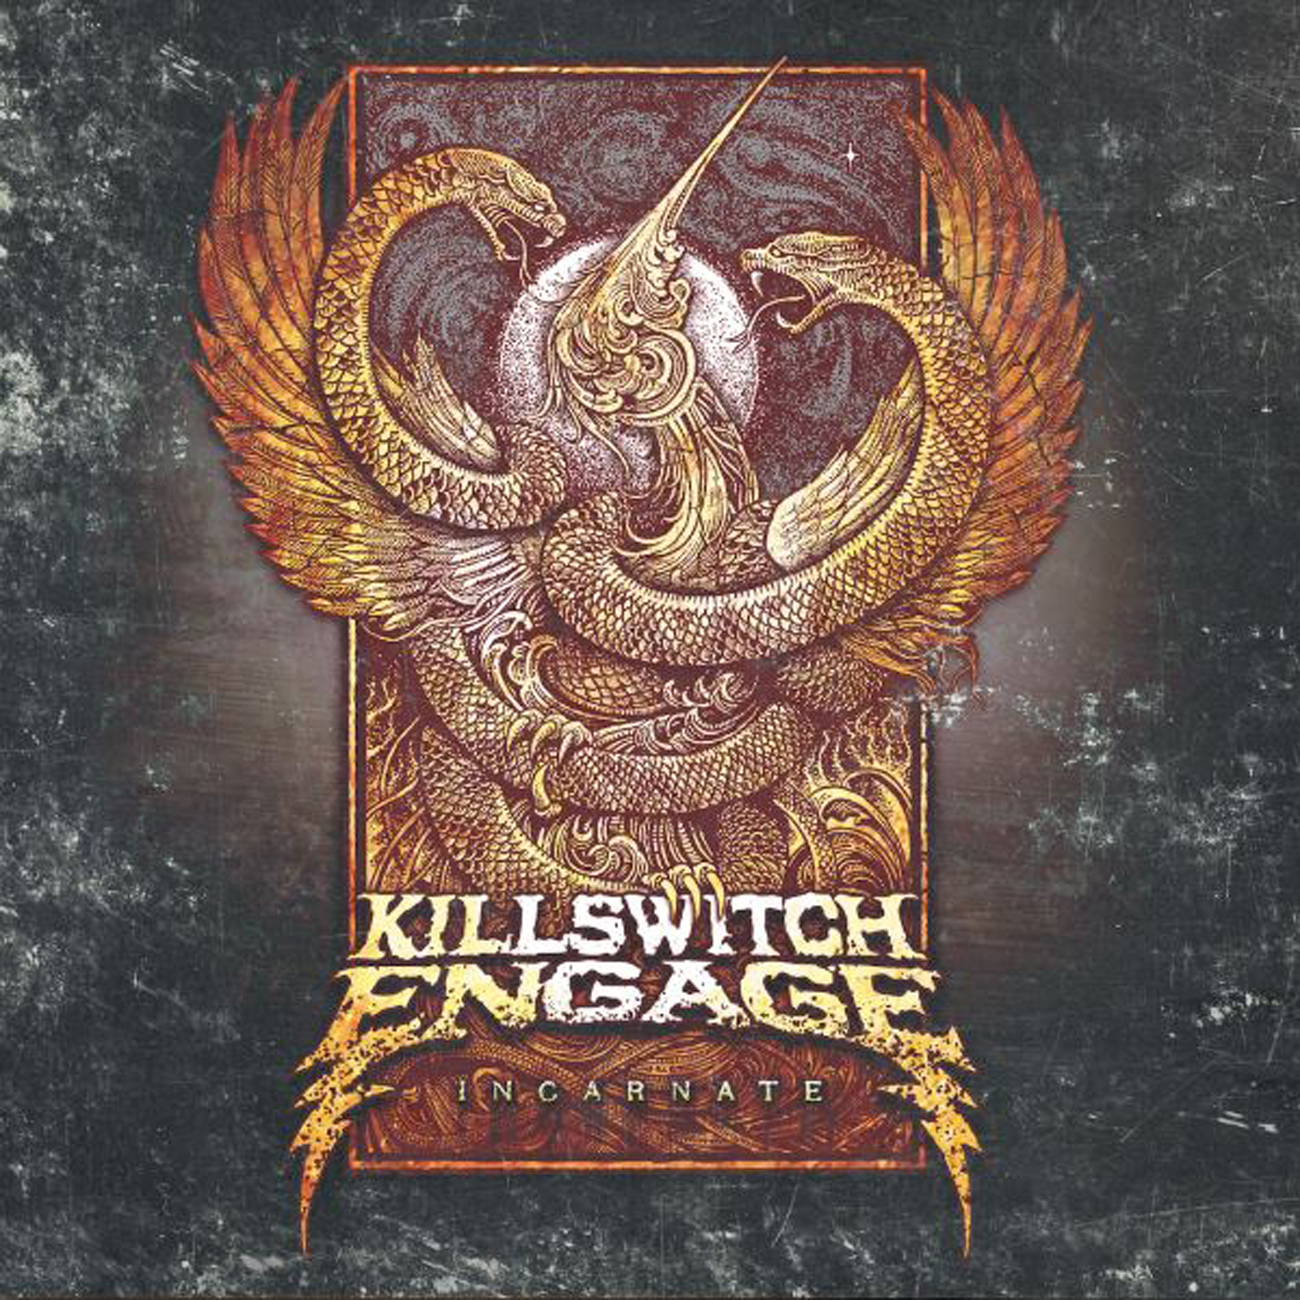 killswsitch engage, incarnate, new album, 2016